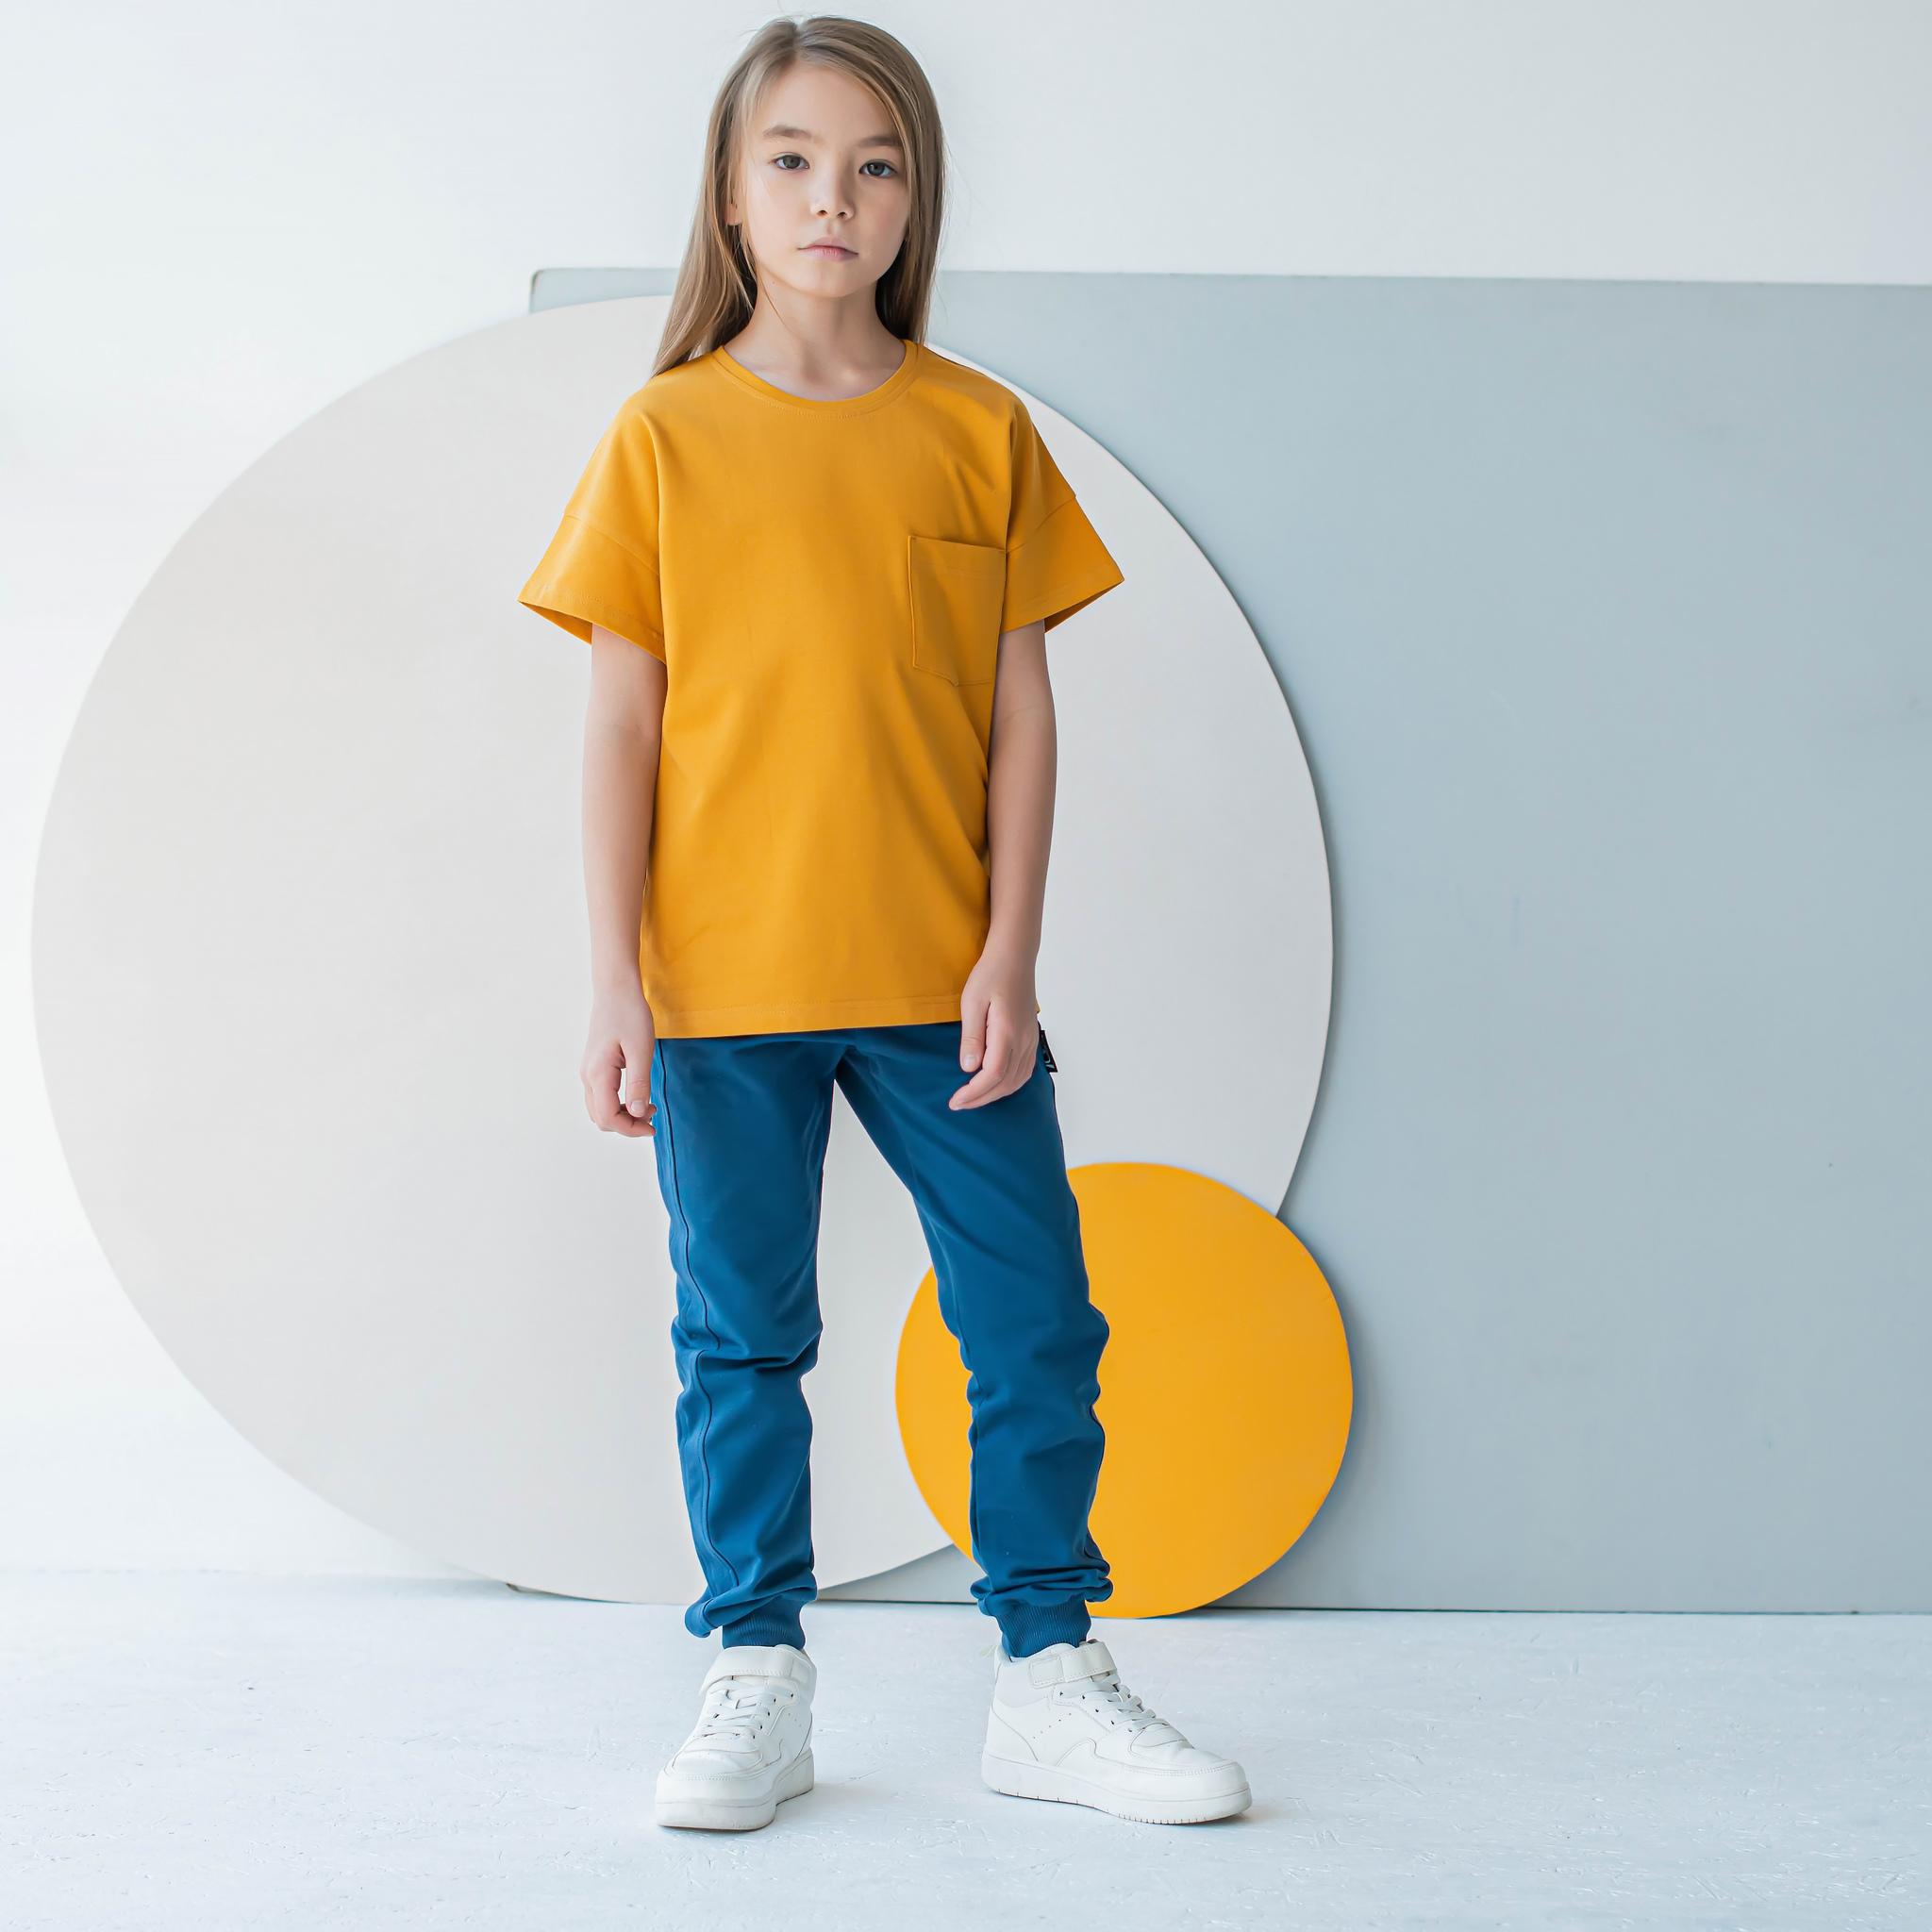 Basic T-shirt for teens - Mustard